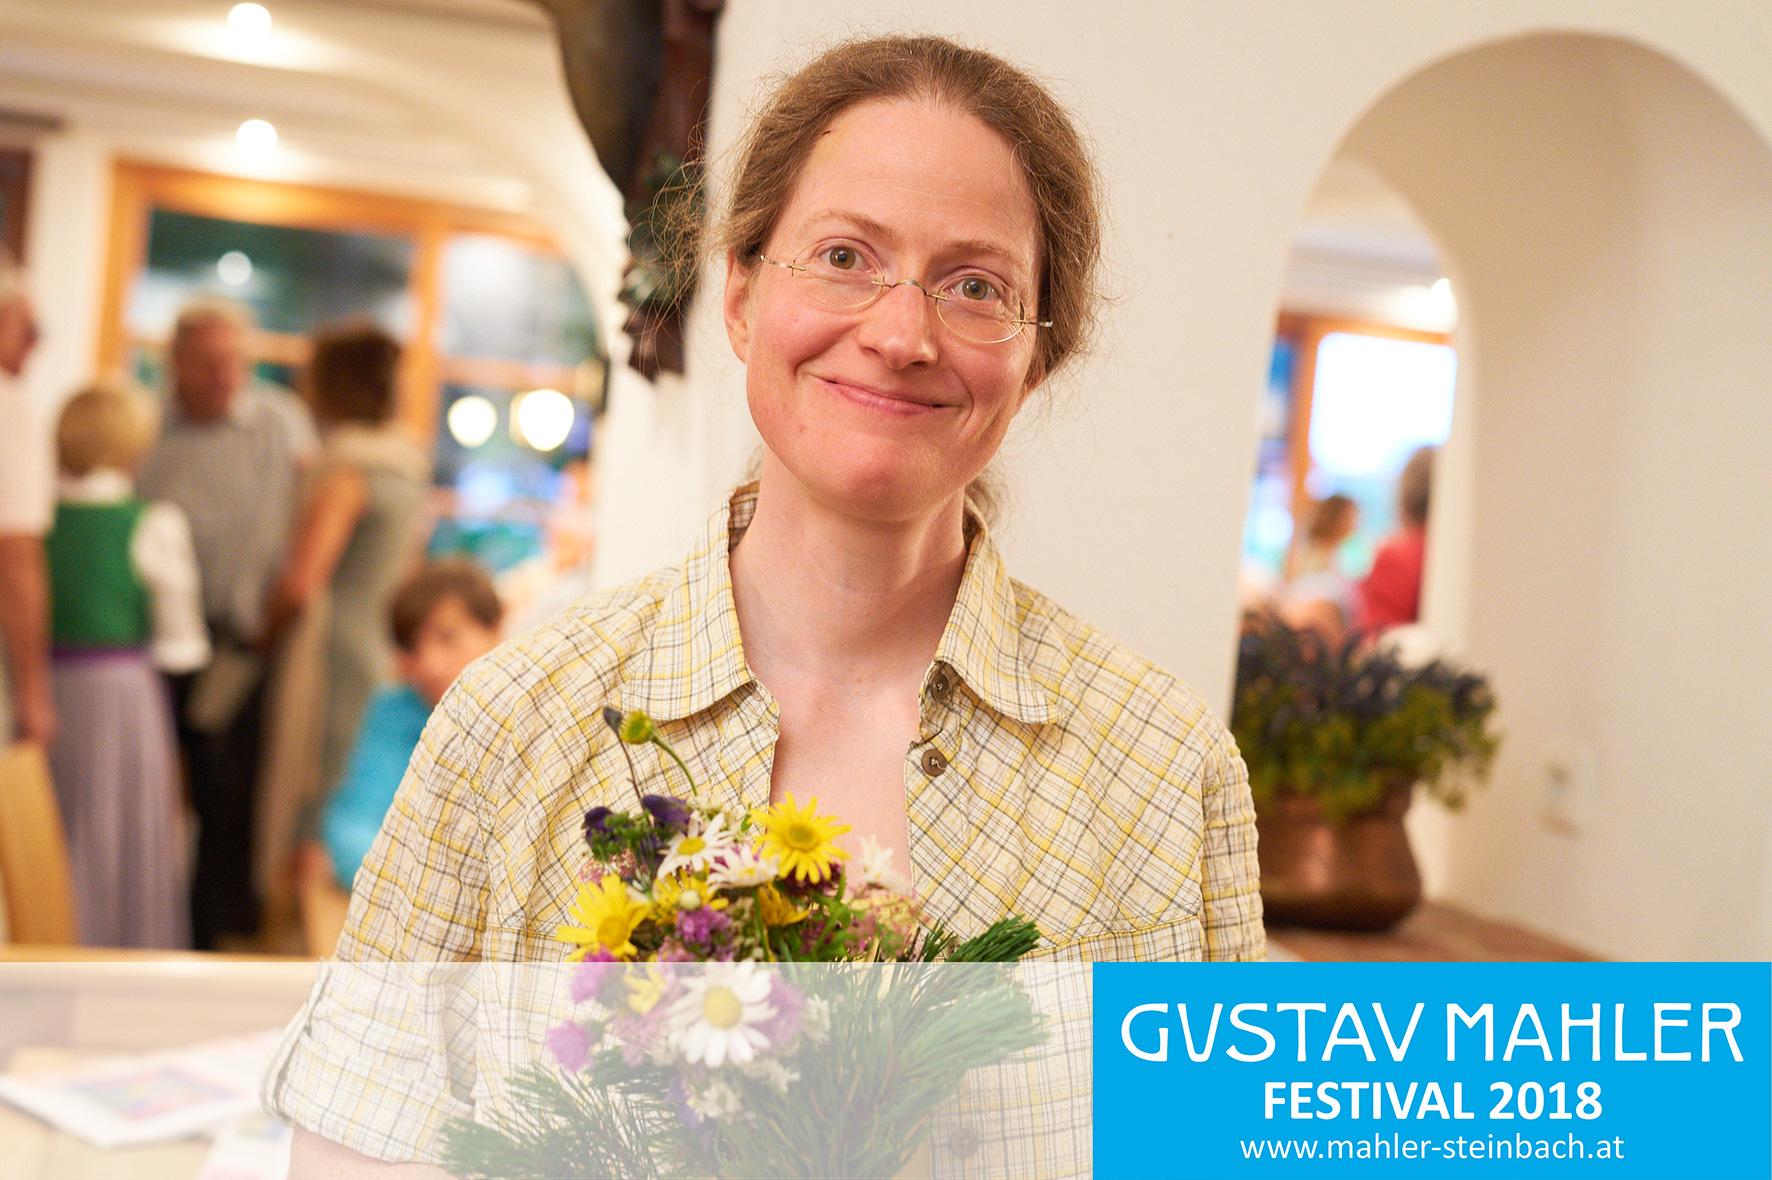 Silja Haller, Mahler in Lied und Wort, 3. Gustav Mahler Festival